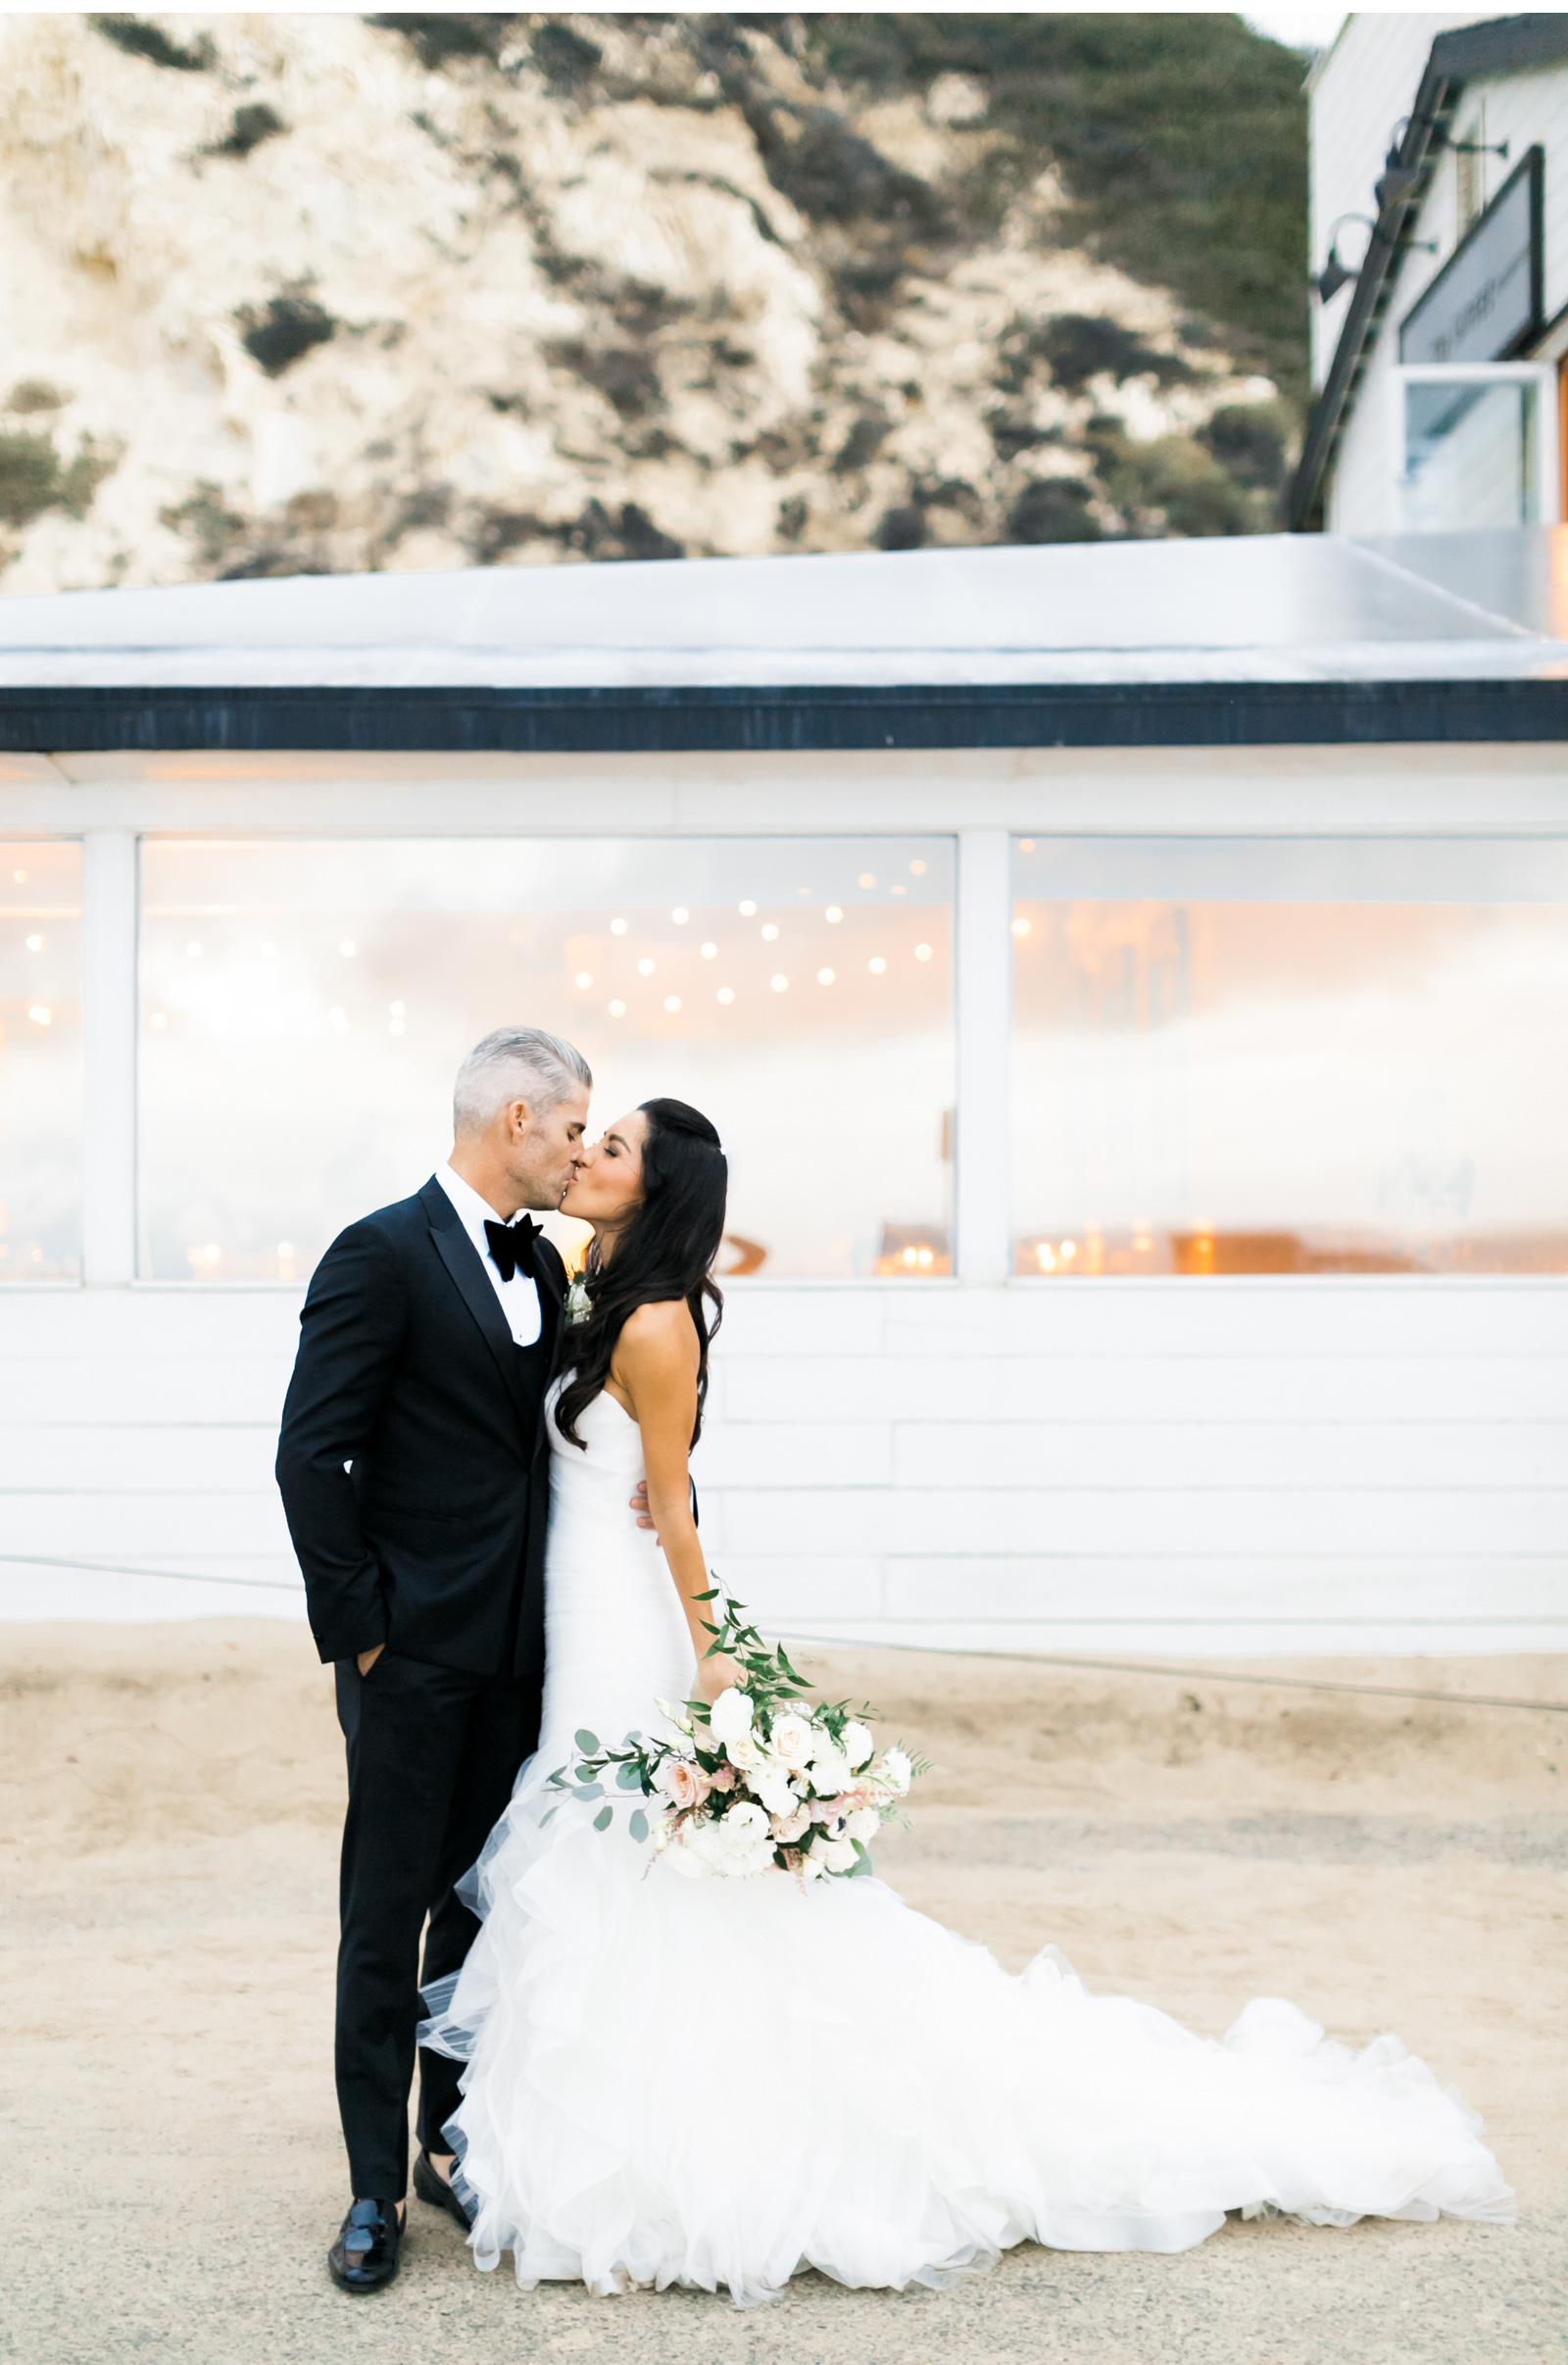 Style-Me-Pretty-Malibu-Beach-CA-Wedding-Natalie-Schutt-Photography_06.jpg